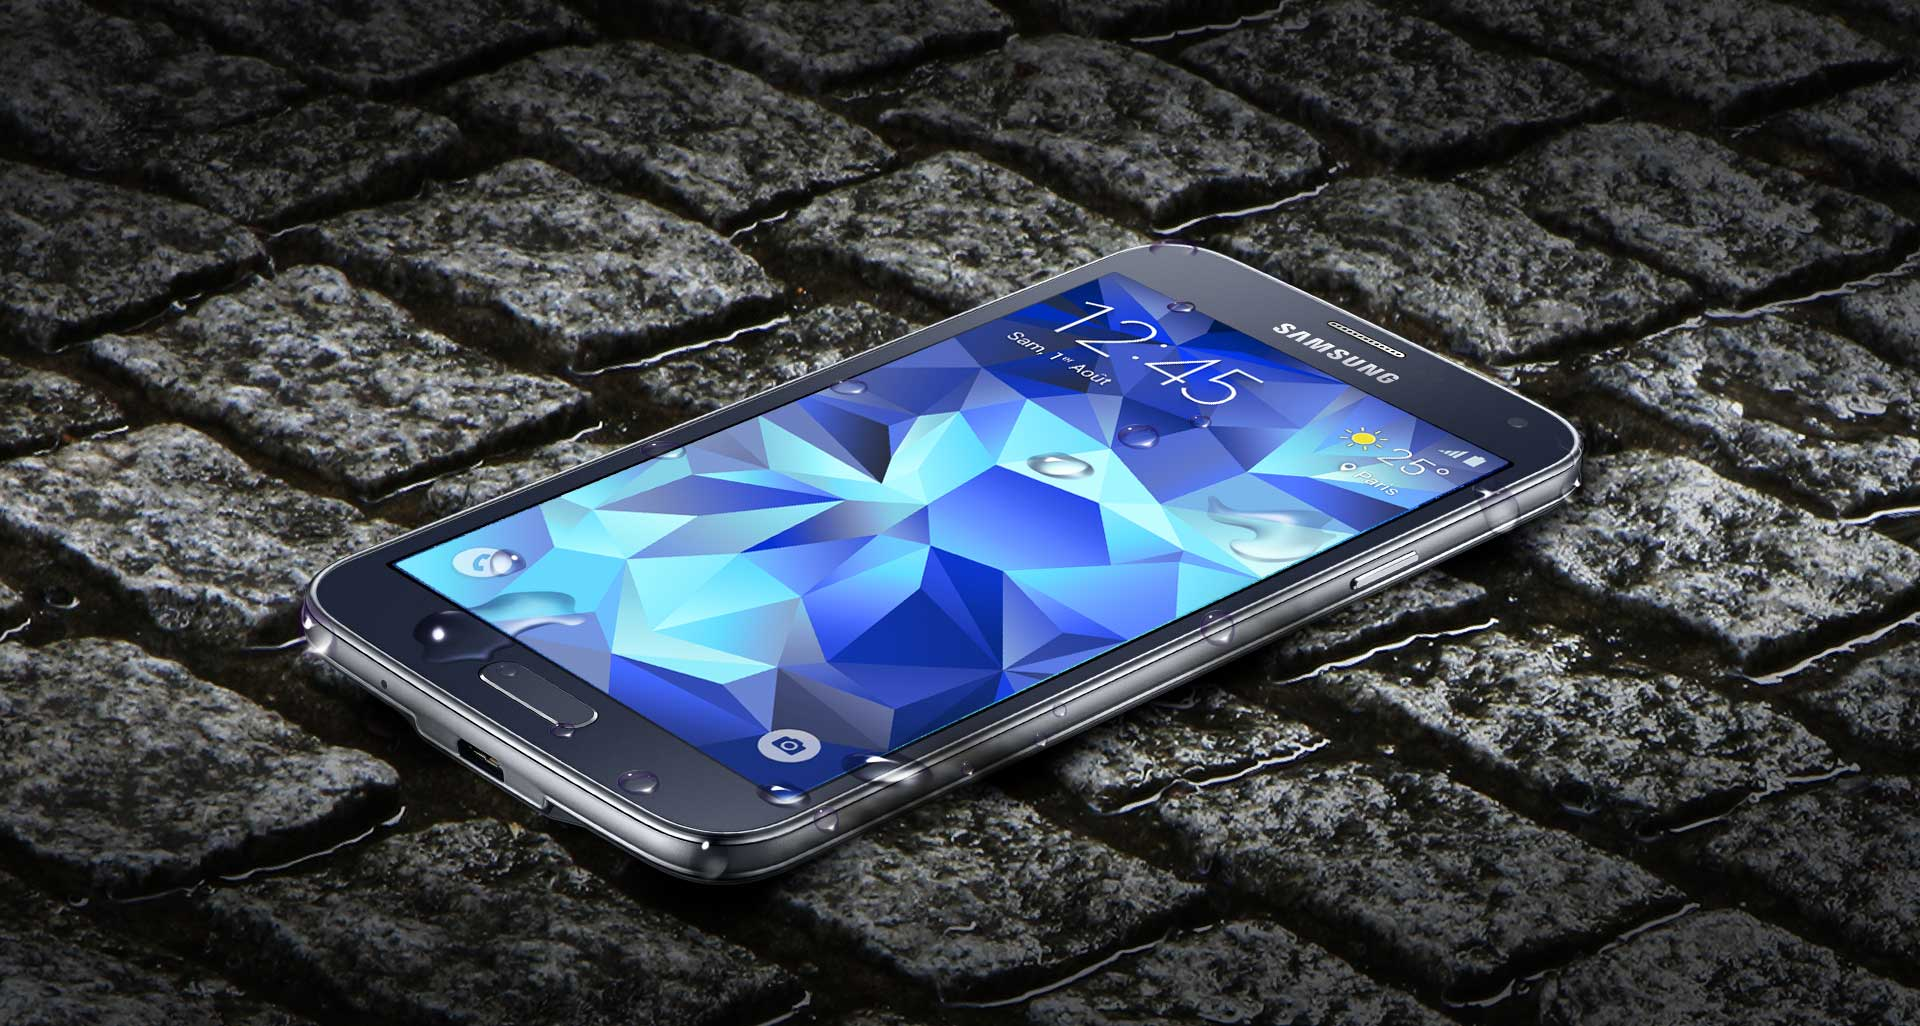 316830 Galaxy S5 Neo Galaxy S5 Legerement Bride Disponible France